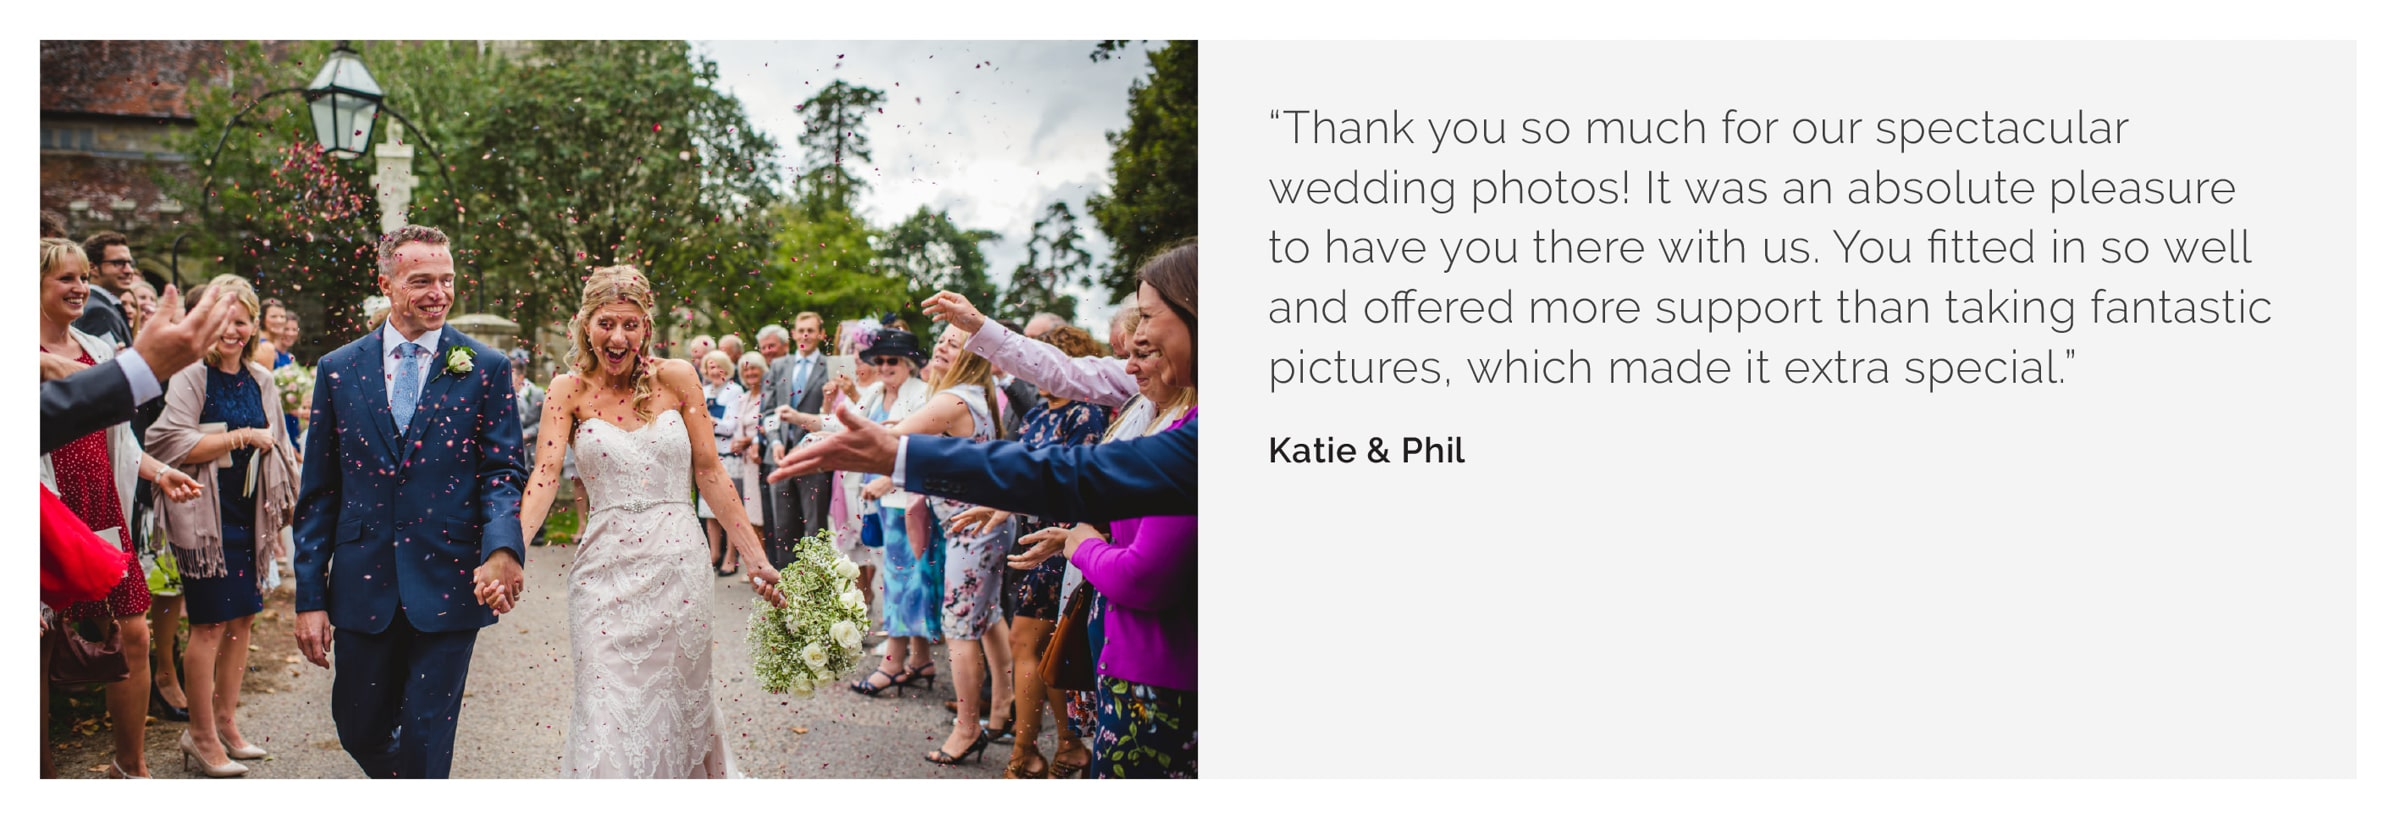 Hants wedding photography Katie Phil